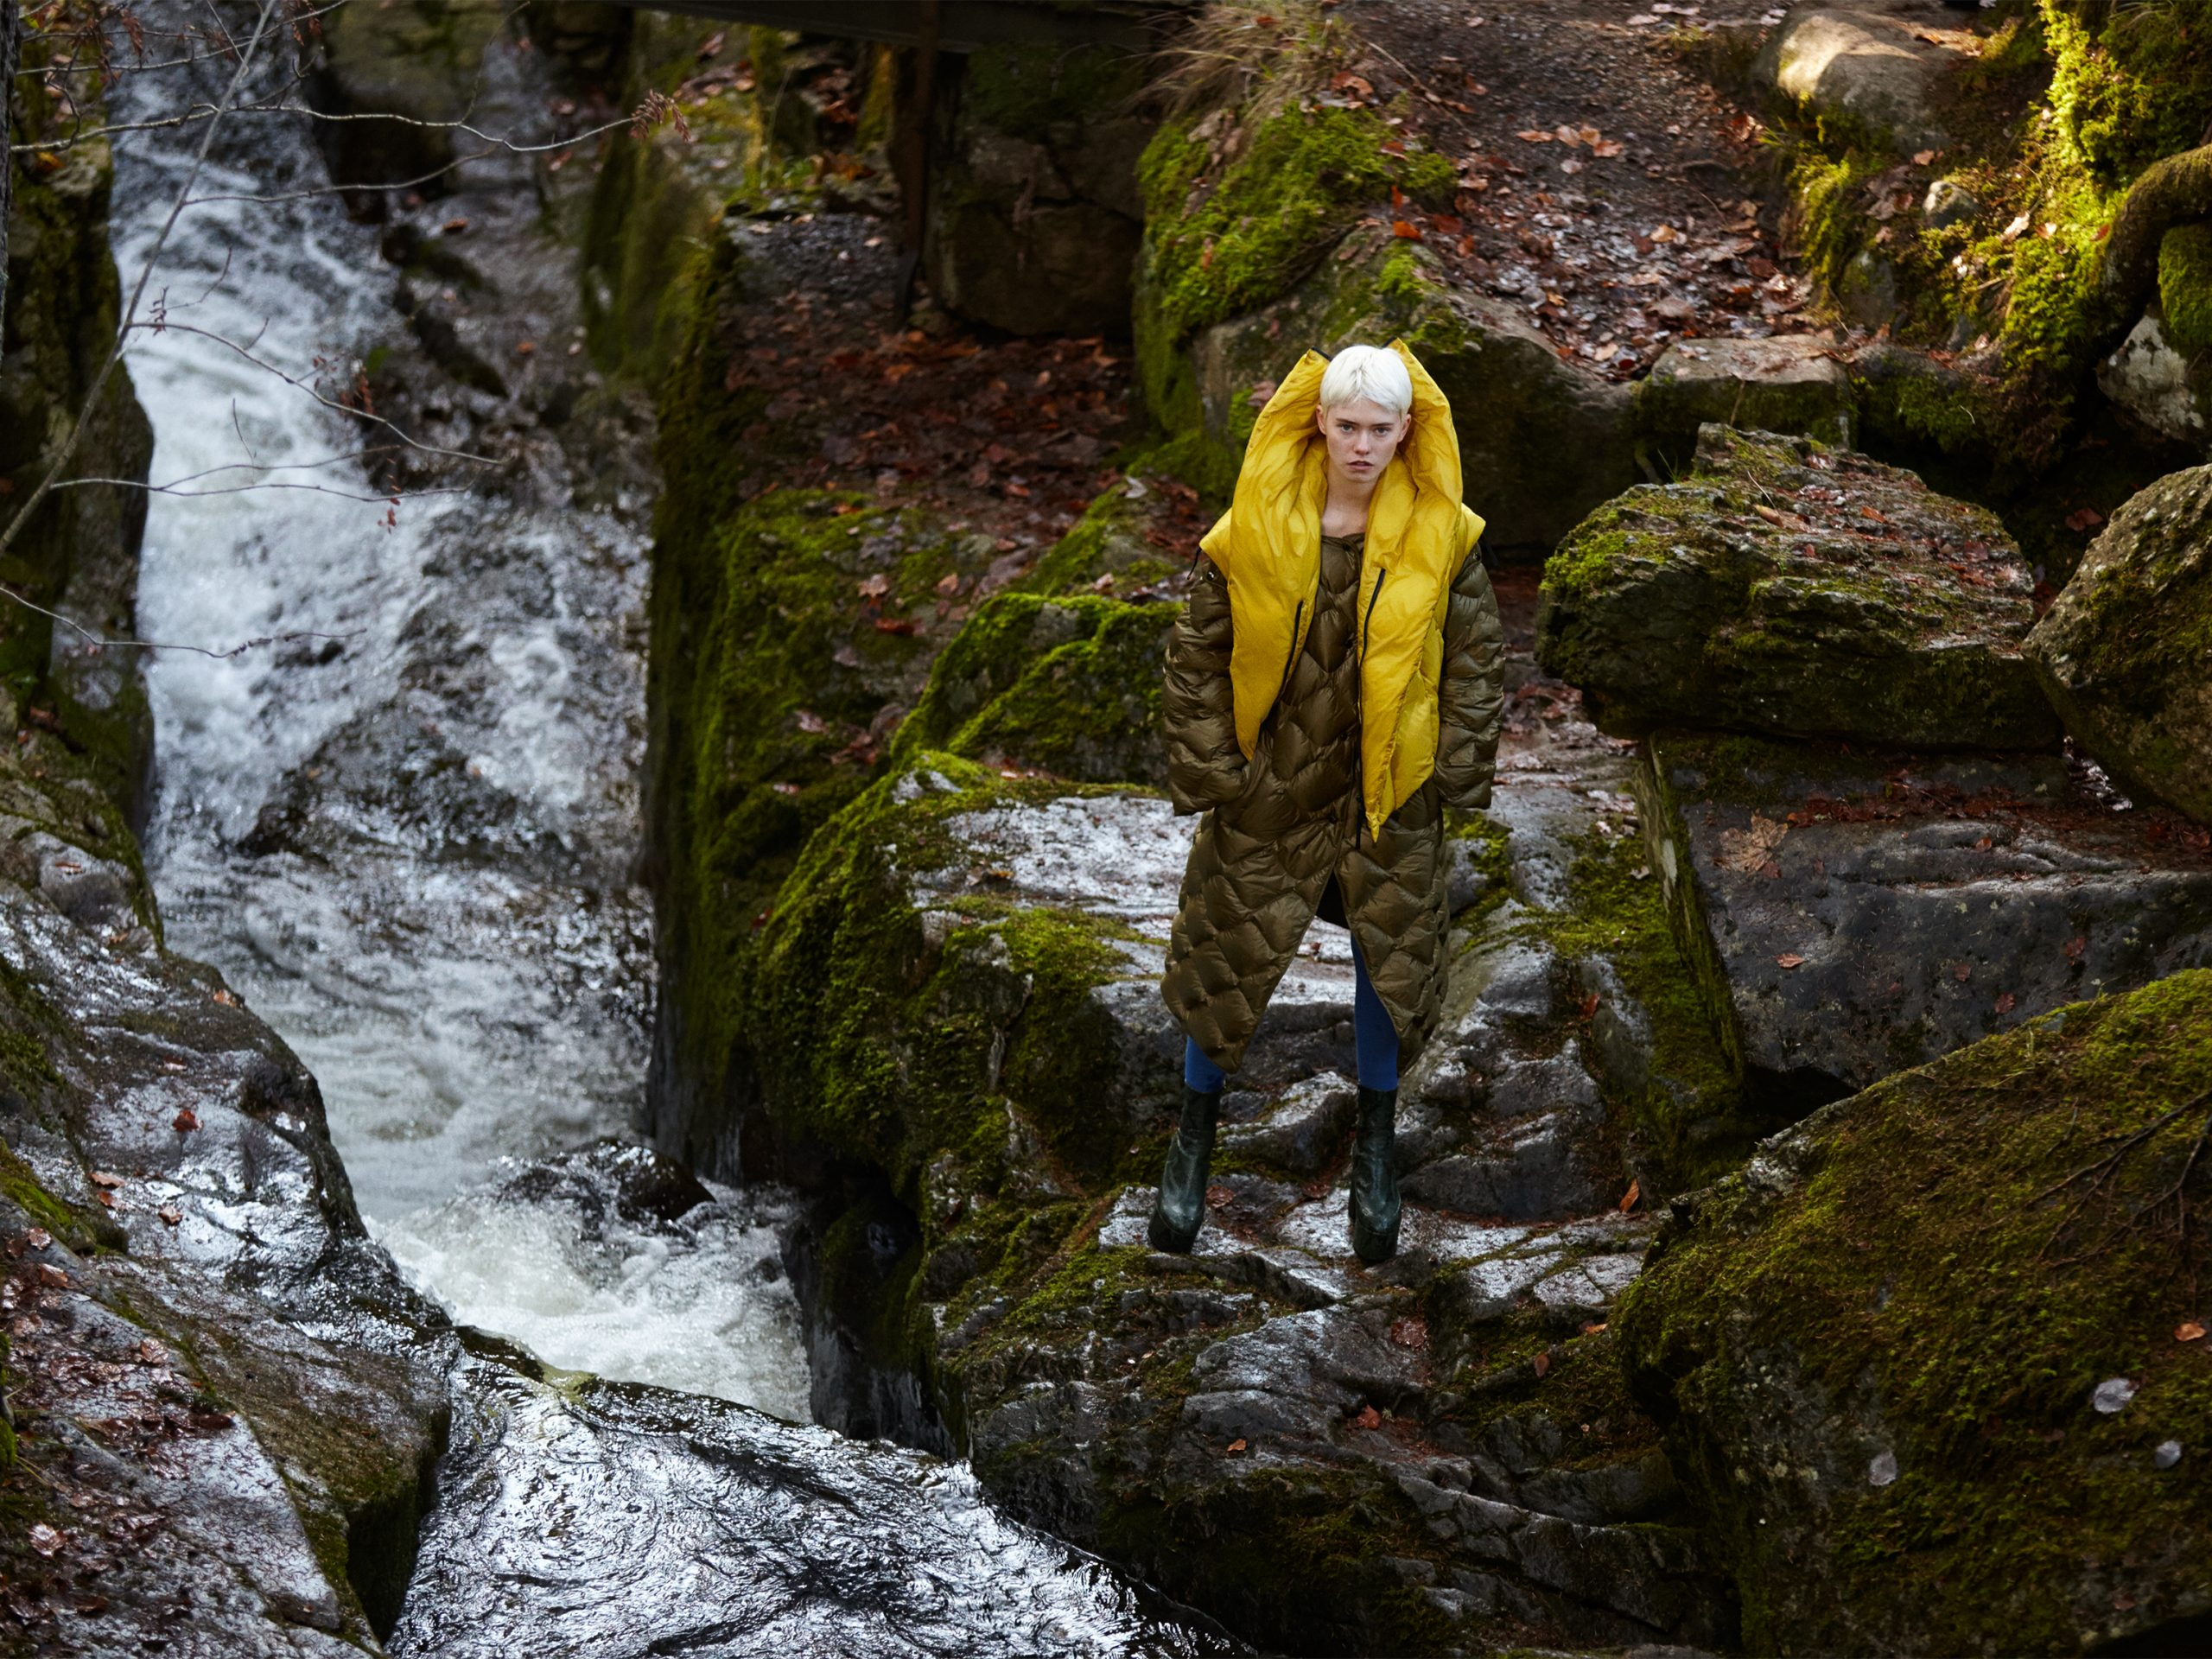 of fog and falls waterfall maike inga in issey miyake